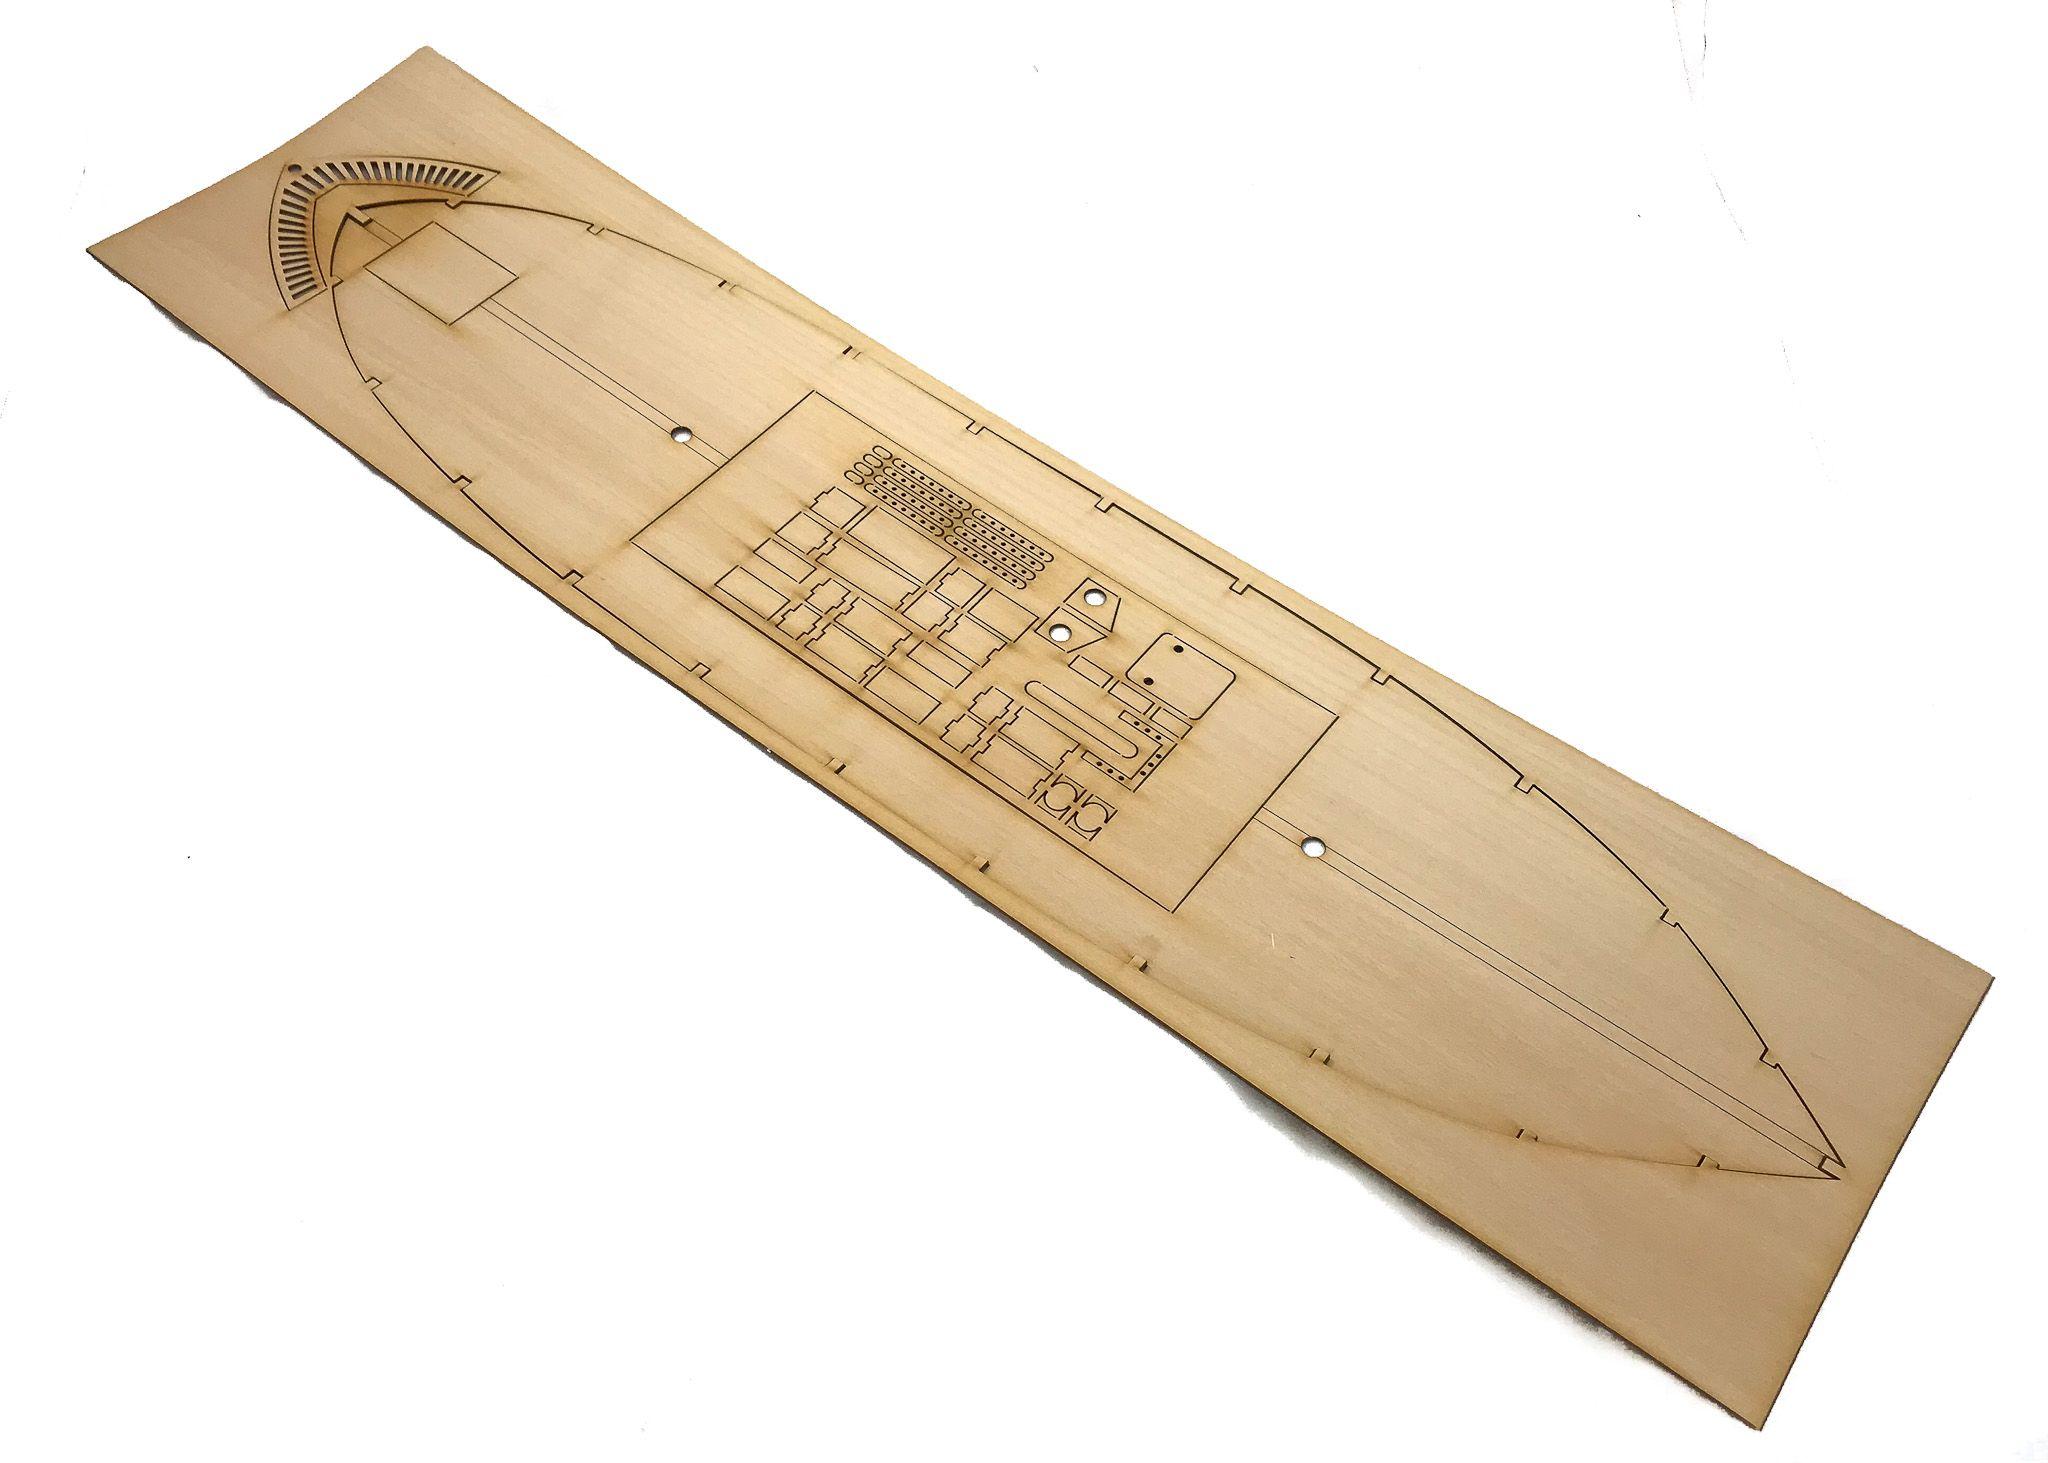 1563-13752-Bruma-Cabin-Cruiser-Kit-Mantua-models-736